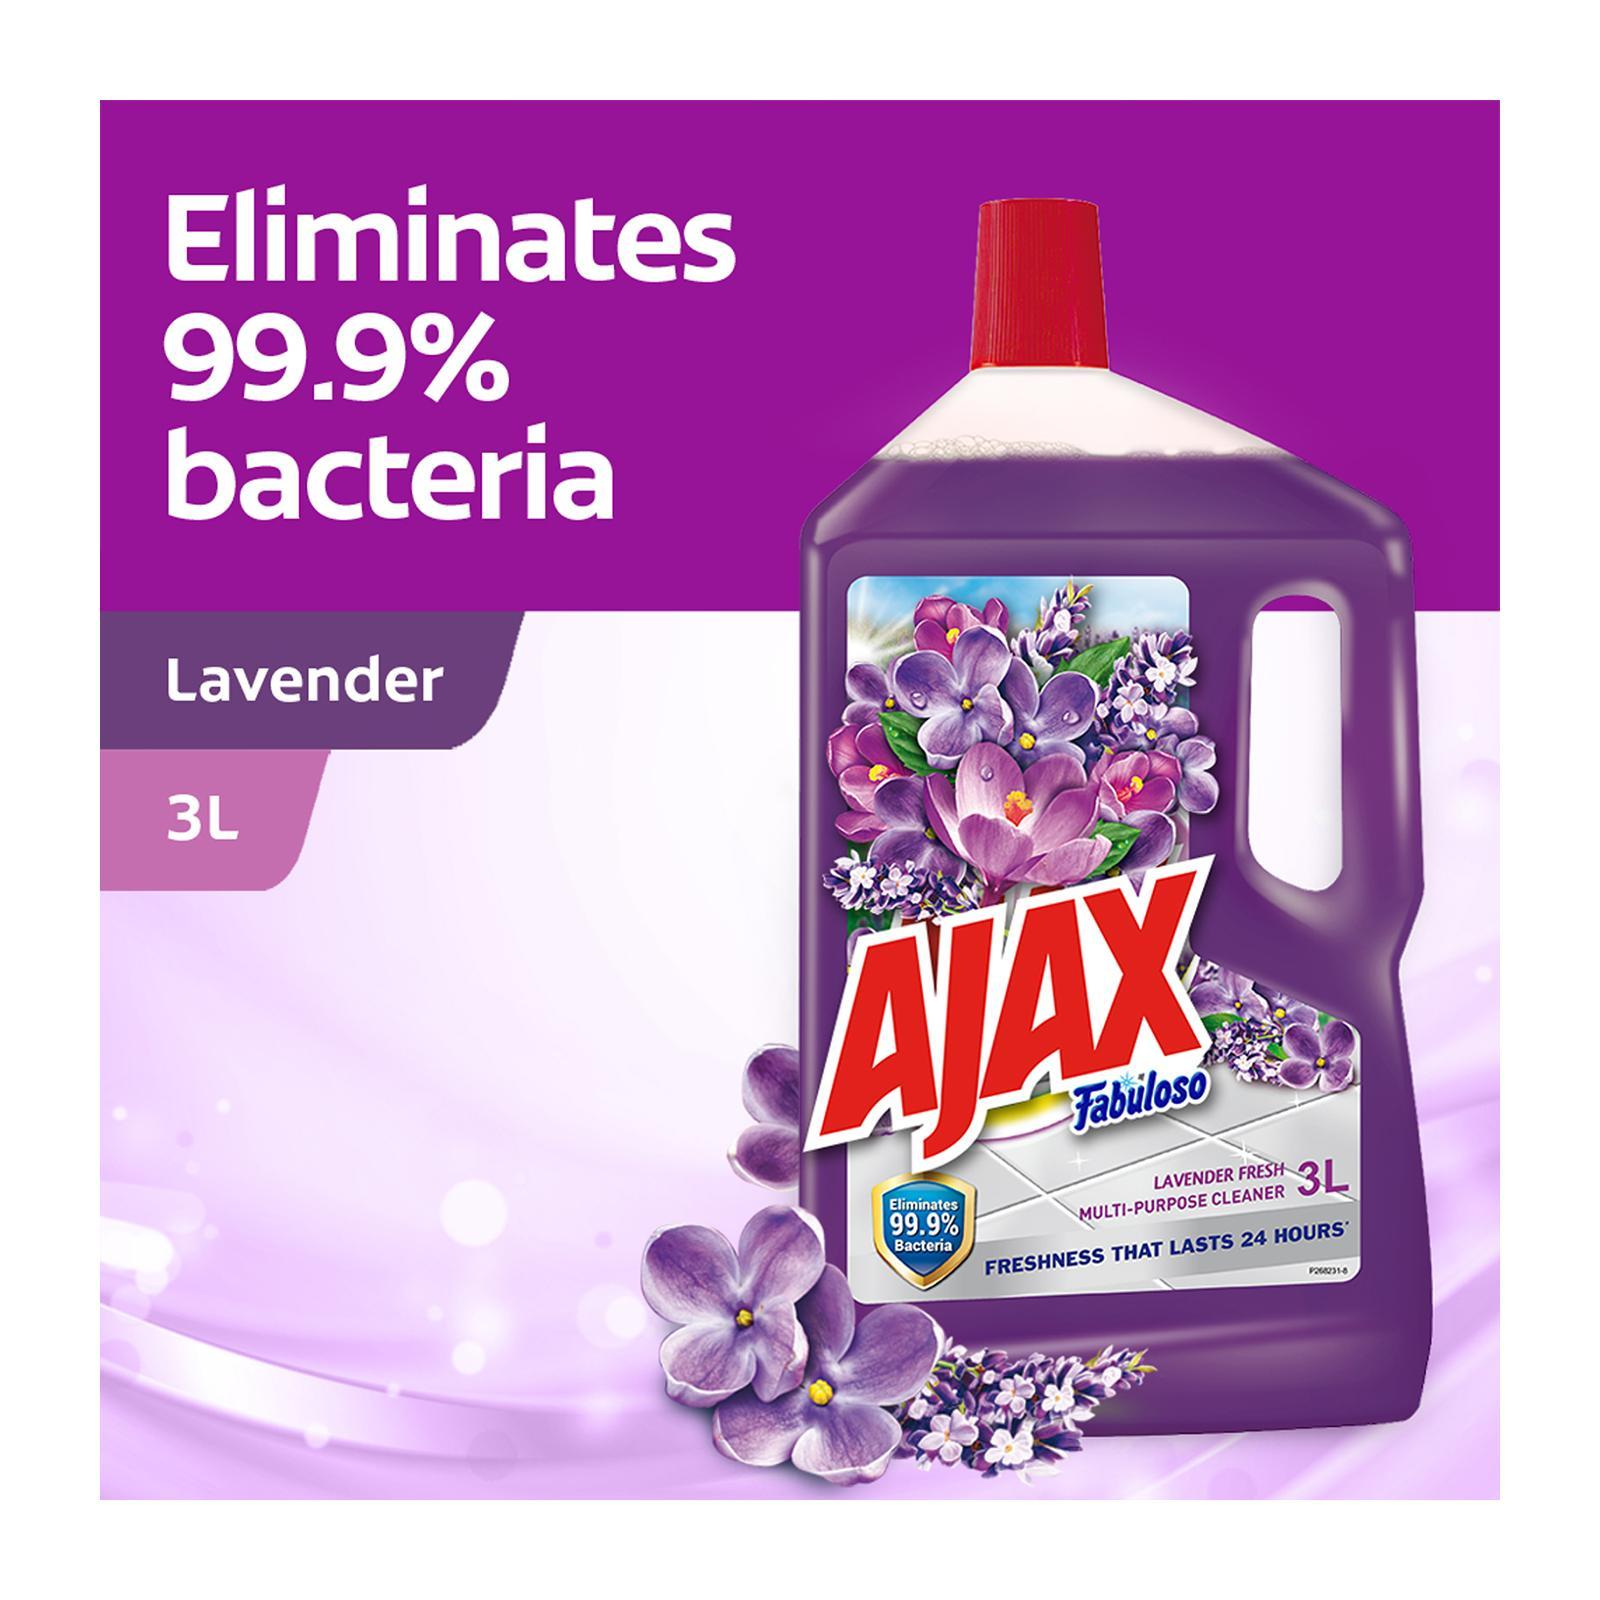 Ajax Fabuloso Lavender Antibacterial Multi Purpose Floor Cleaner 3L